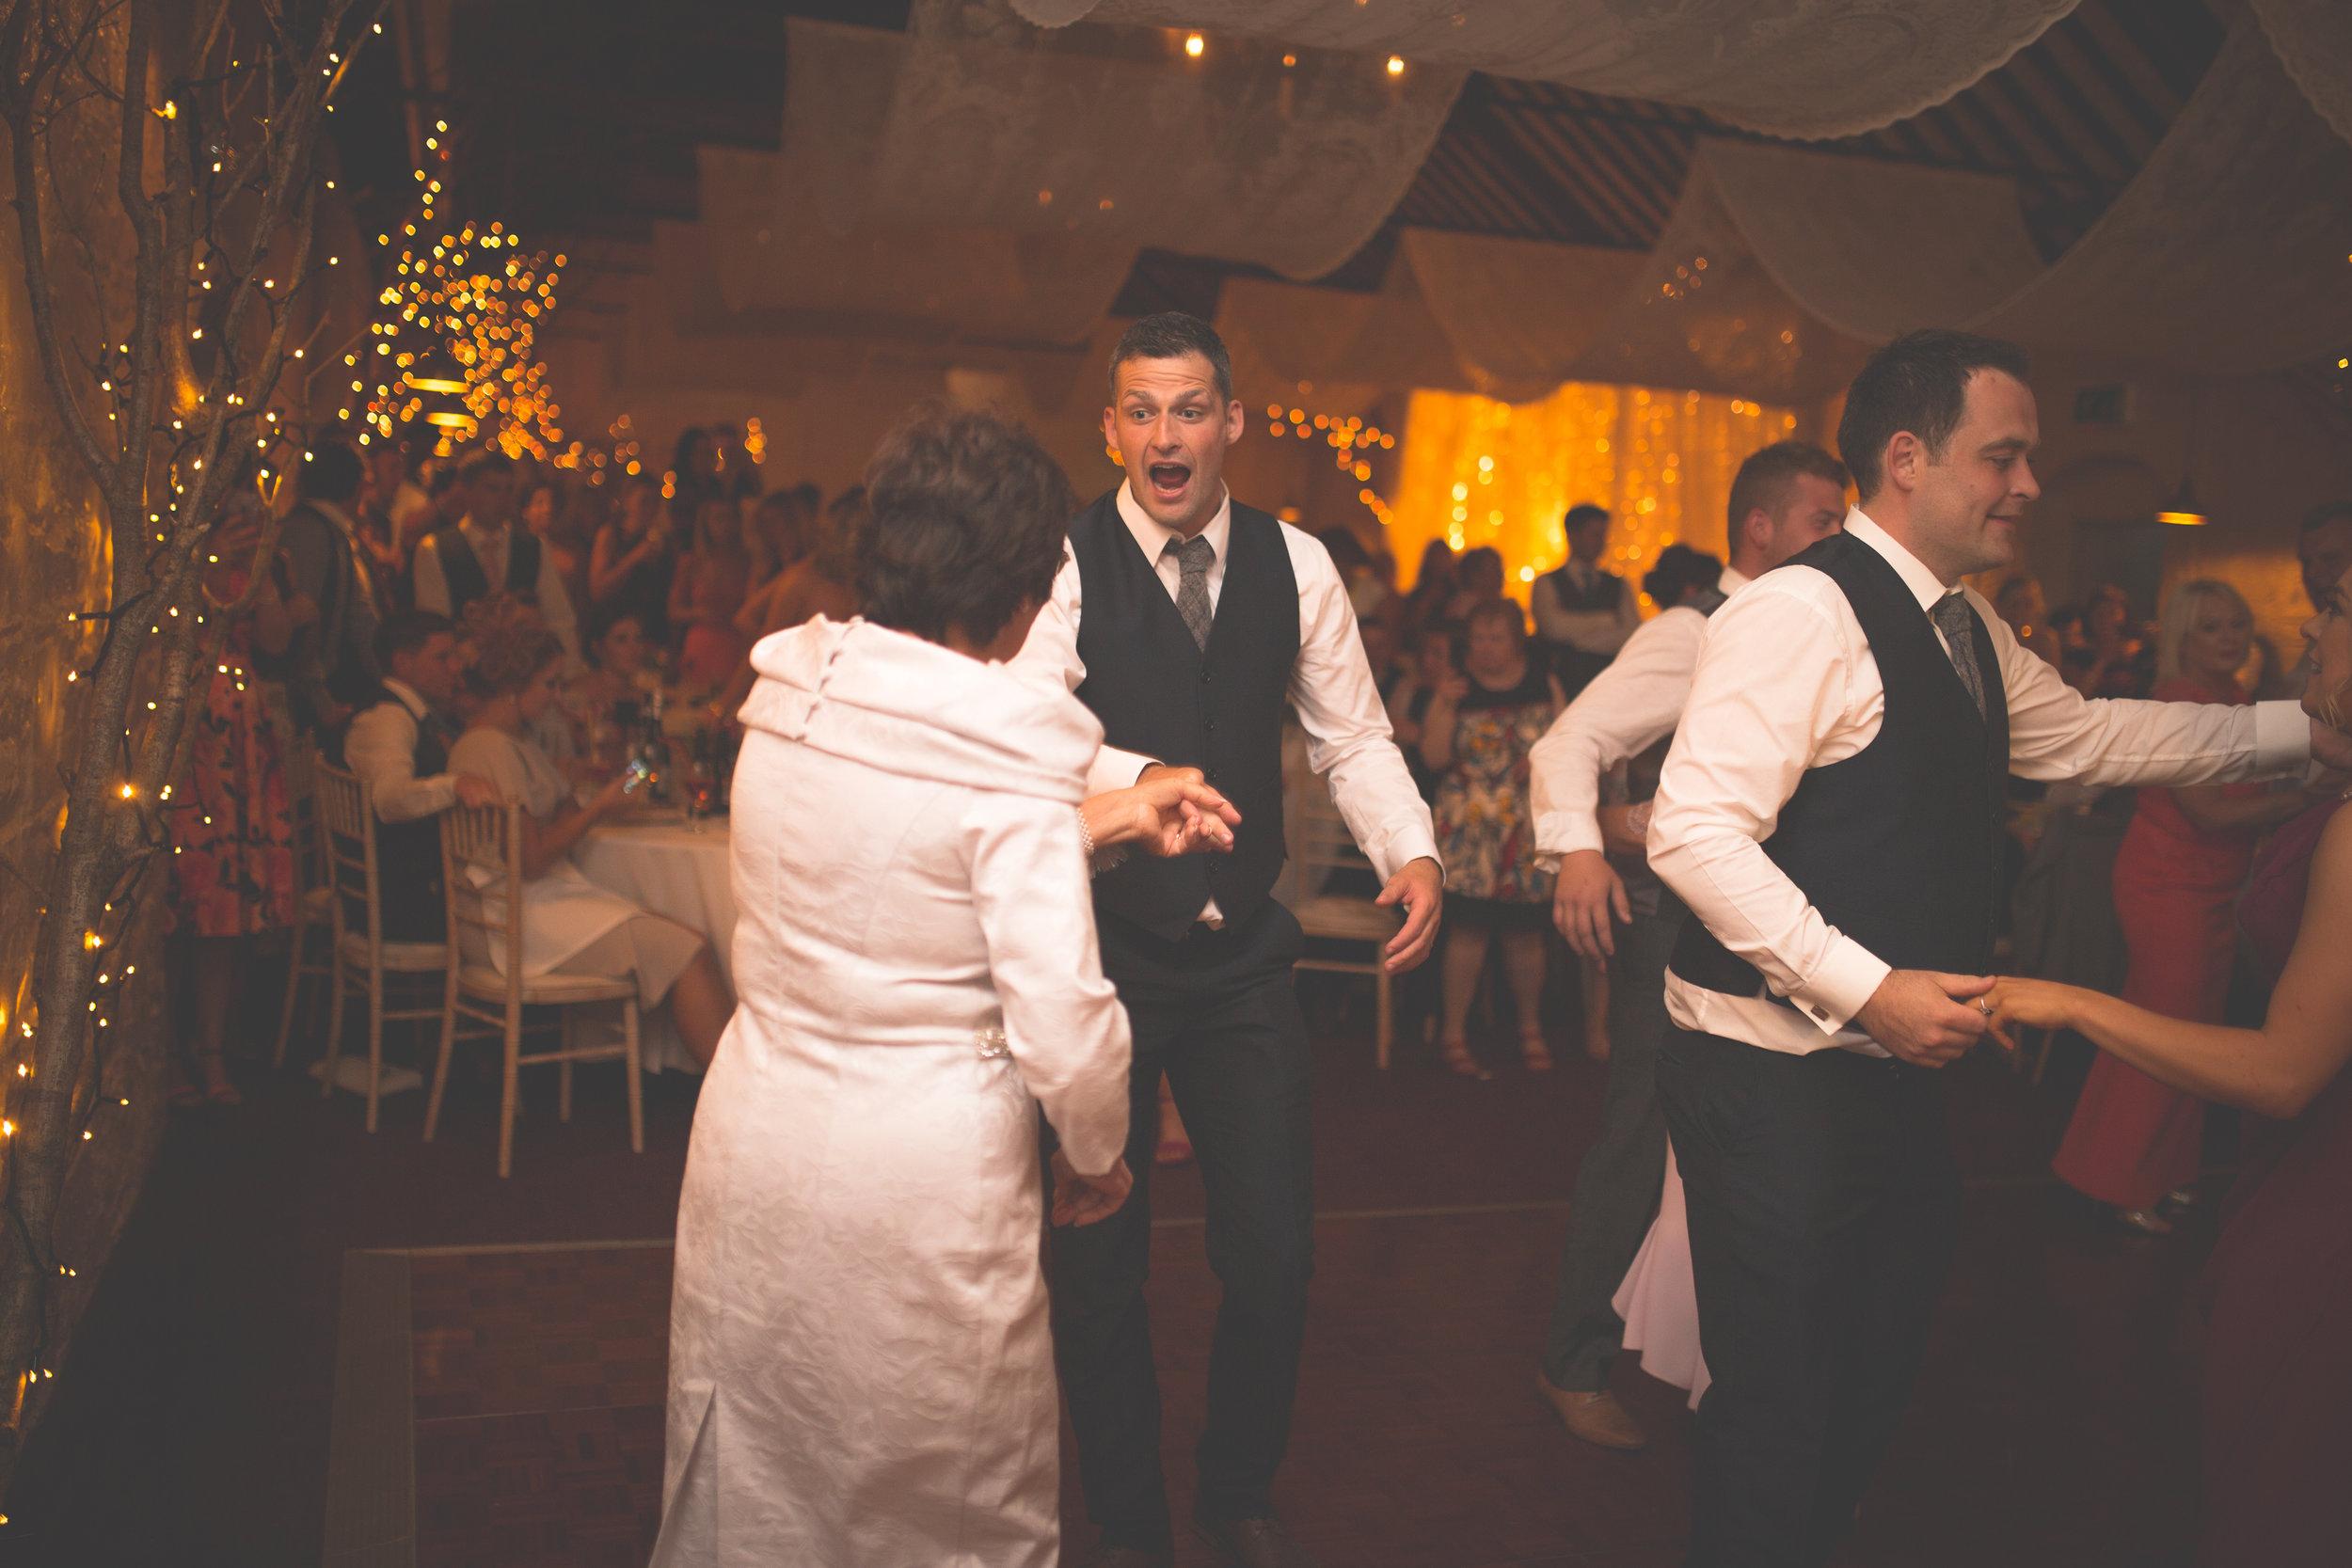 Brian McEwan Wedding Photography | Carol-Annee & Sean | The Dancing-45.jpg